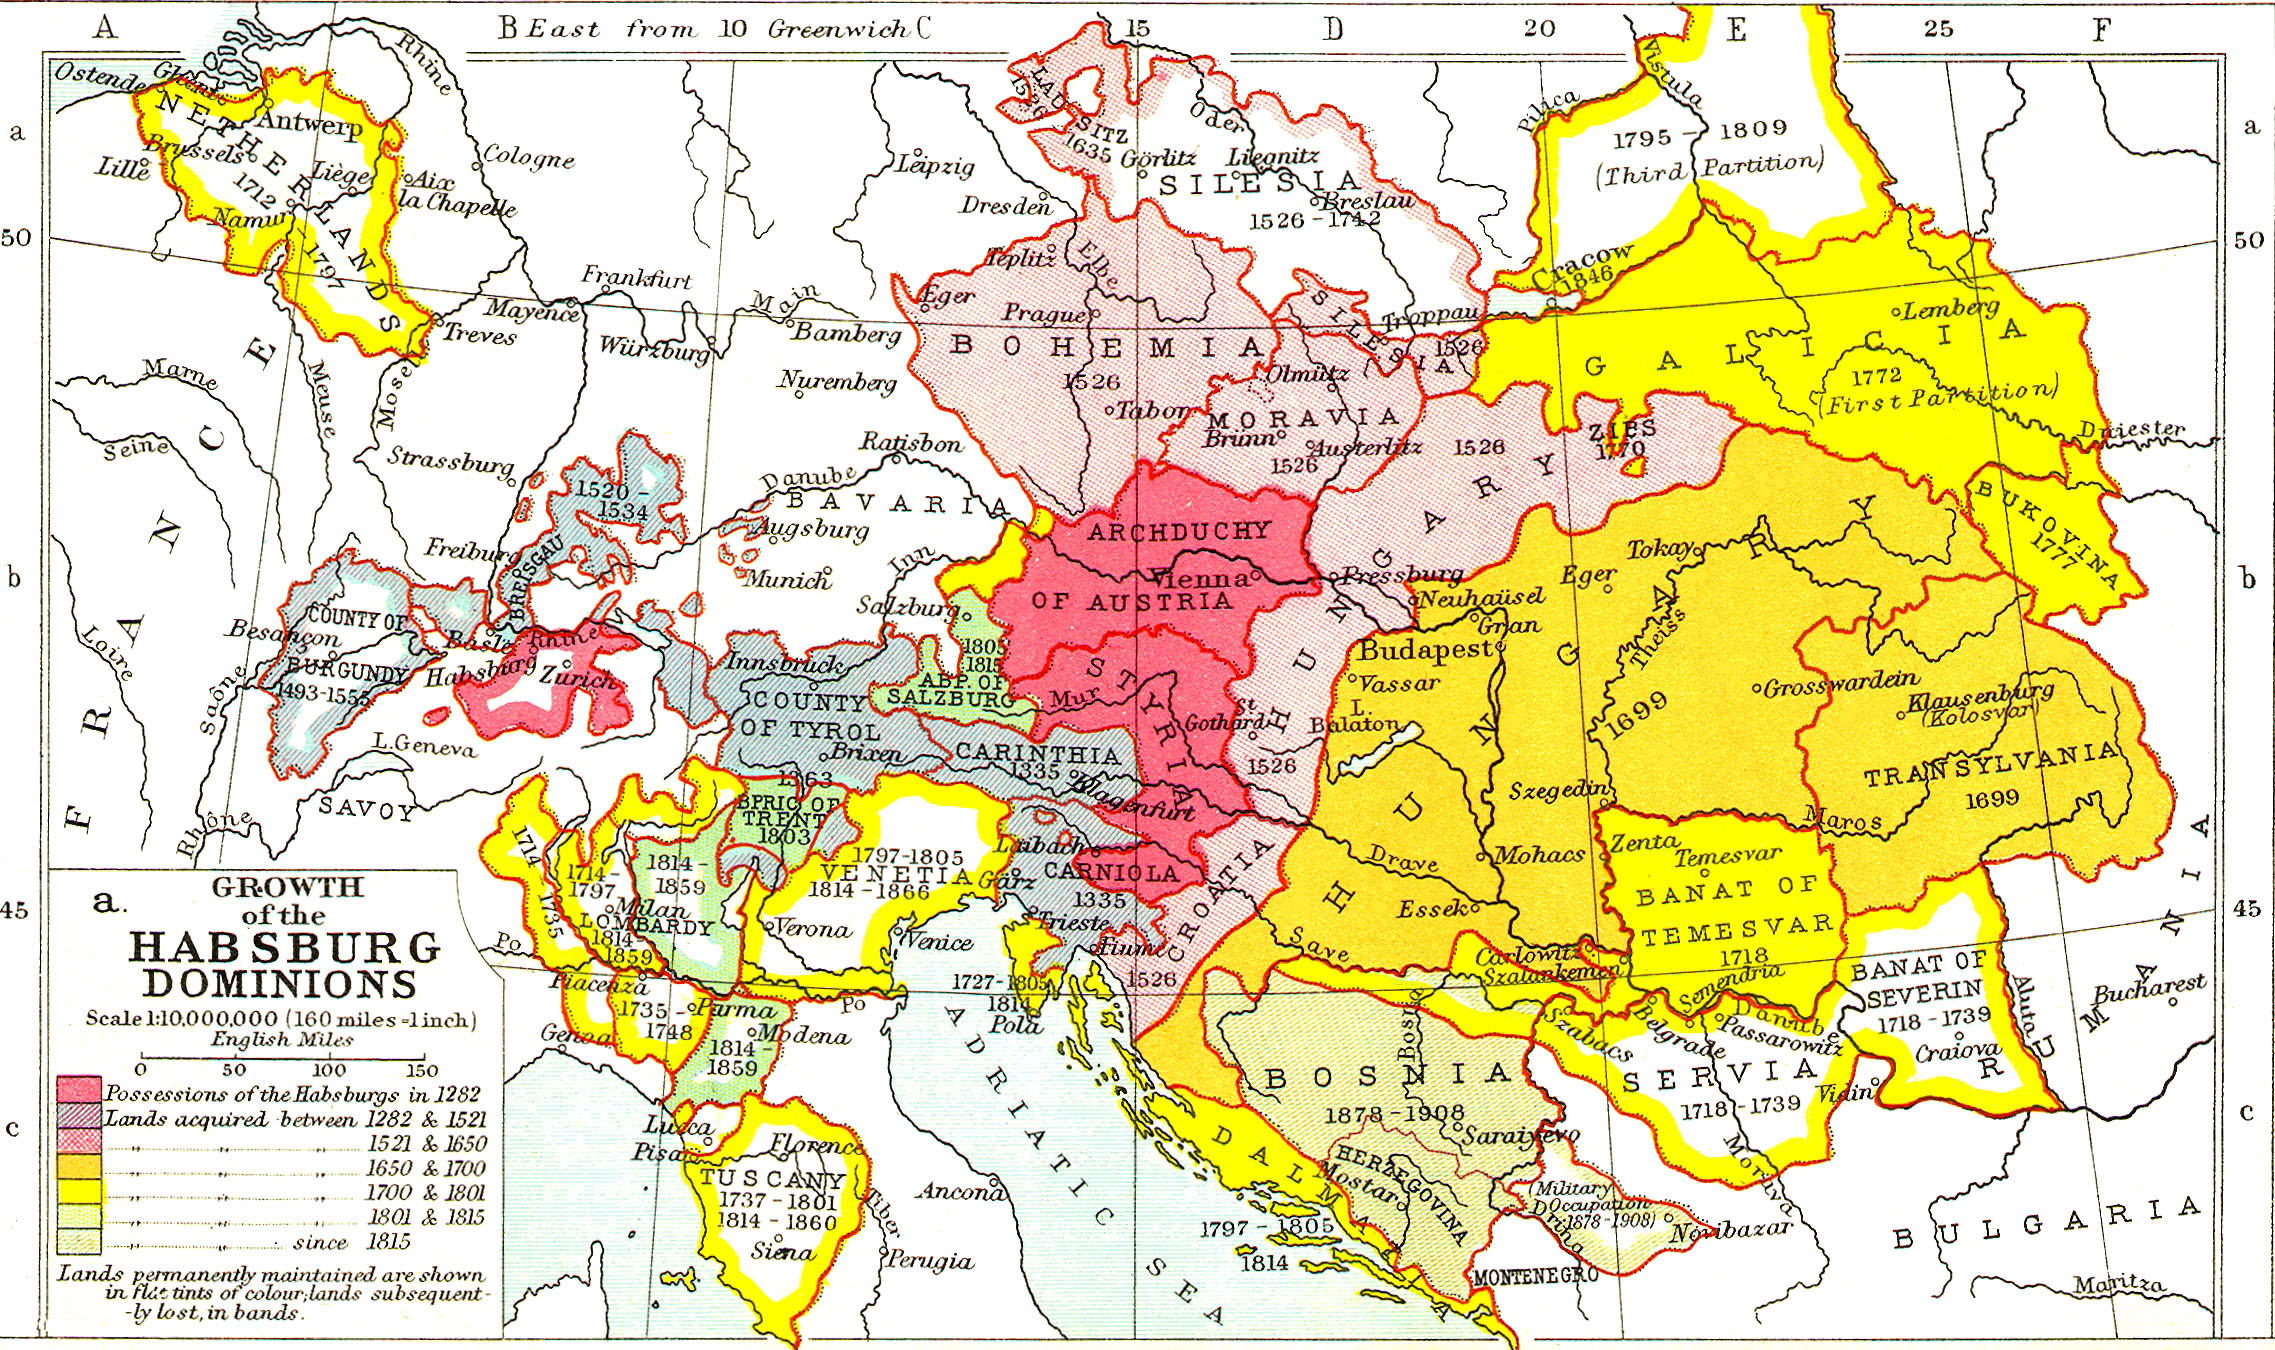 https://i0.wp.com/upload.wikimedia.org/wikipedia/commons/8/8e/Growth_of_Habsburg_territories.jpg